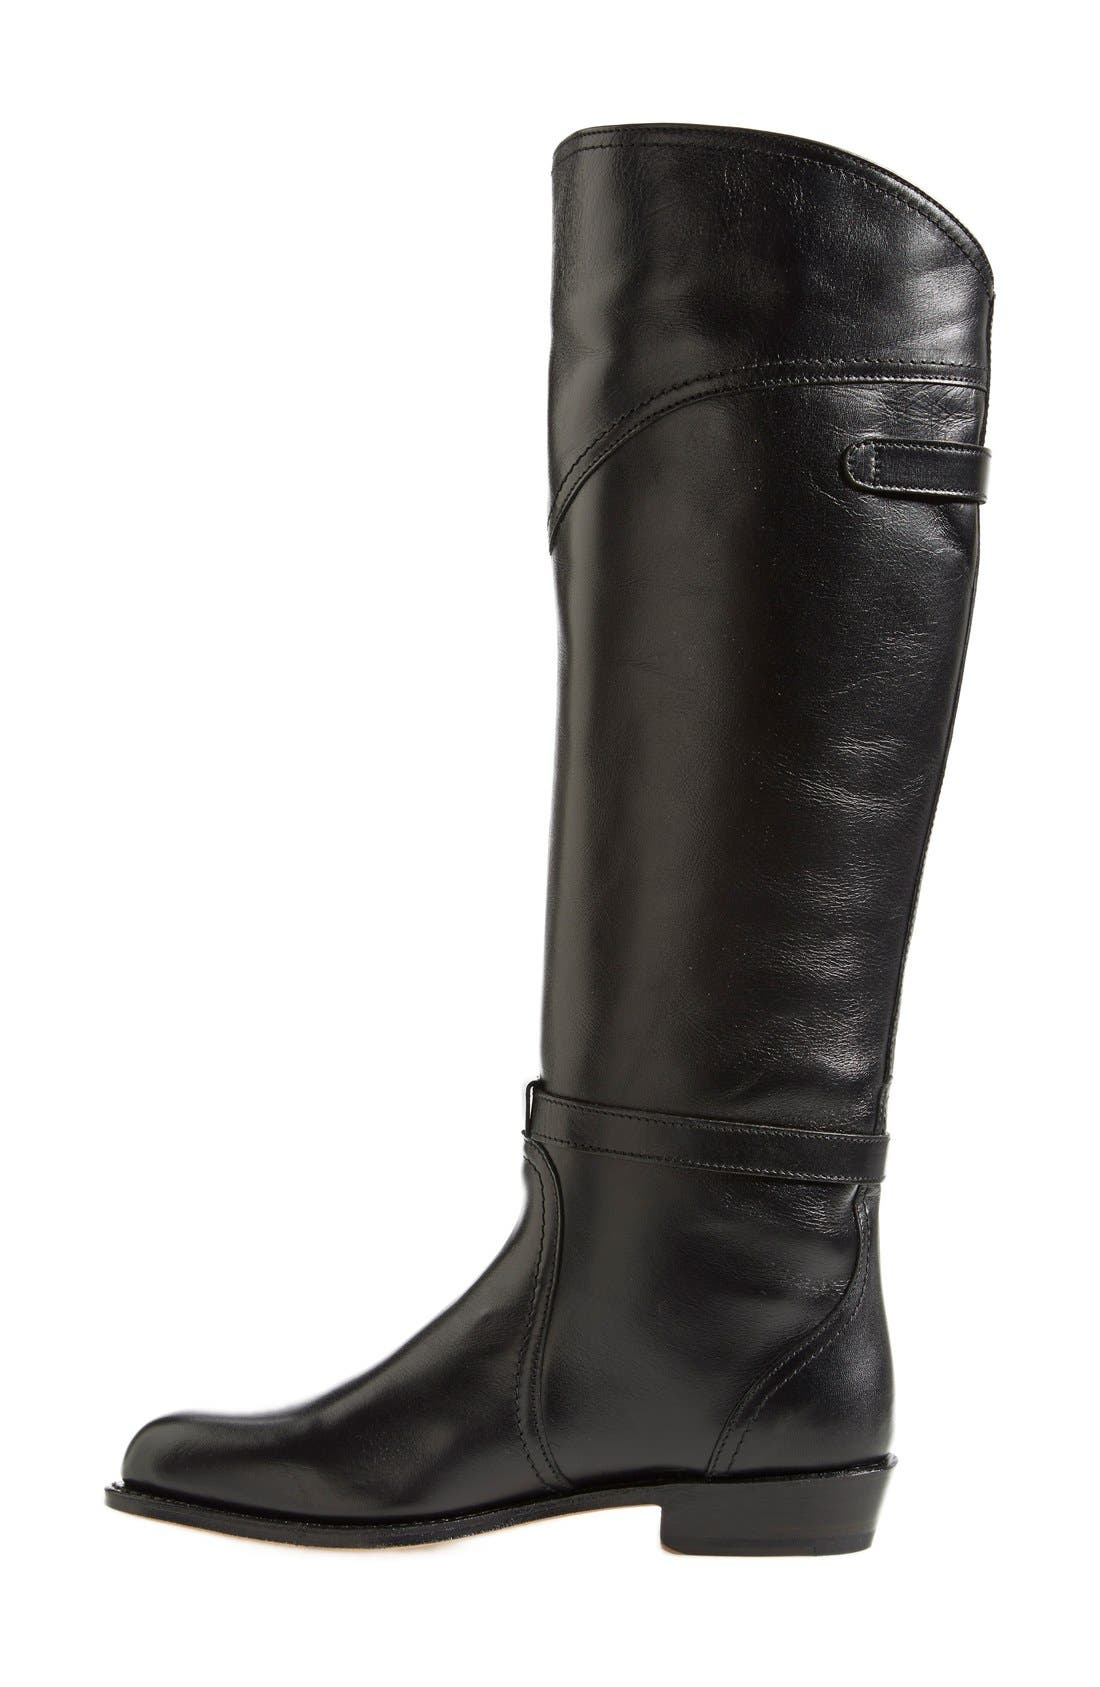 'Dorado' Leather Riding Boot,                             Alternate thumbnail 2, color,                             001